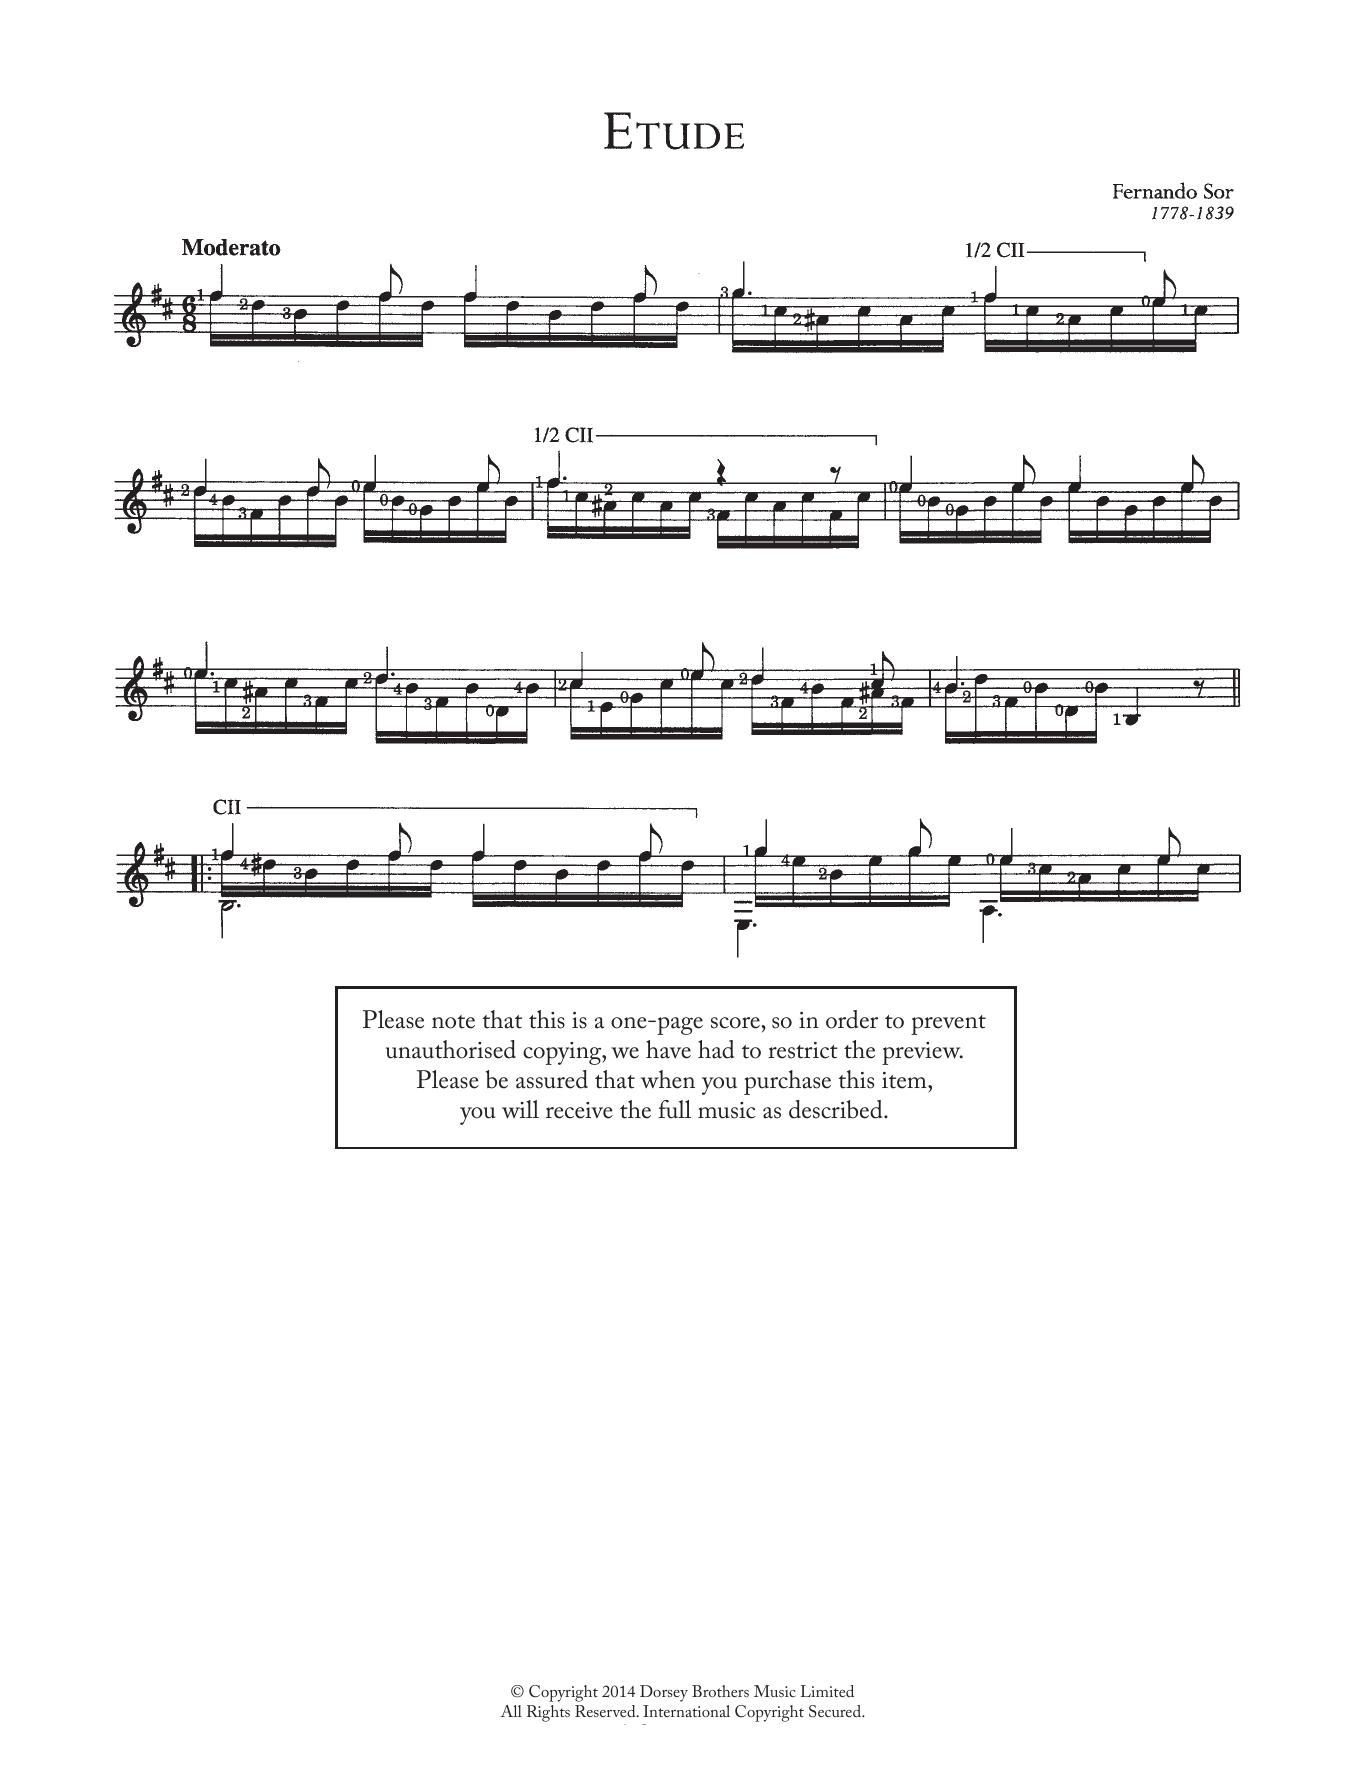 Etude Sheet Music